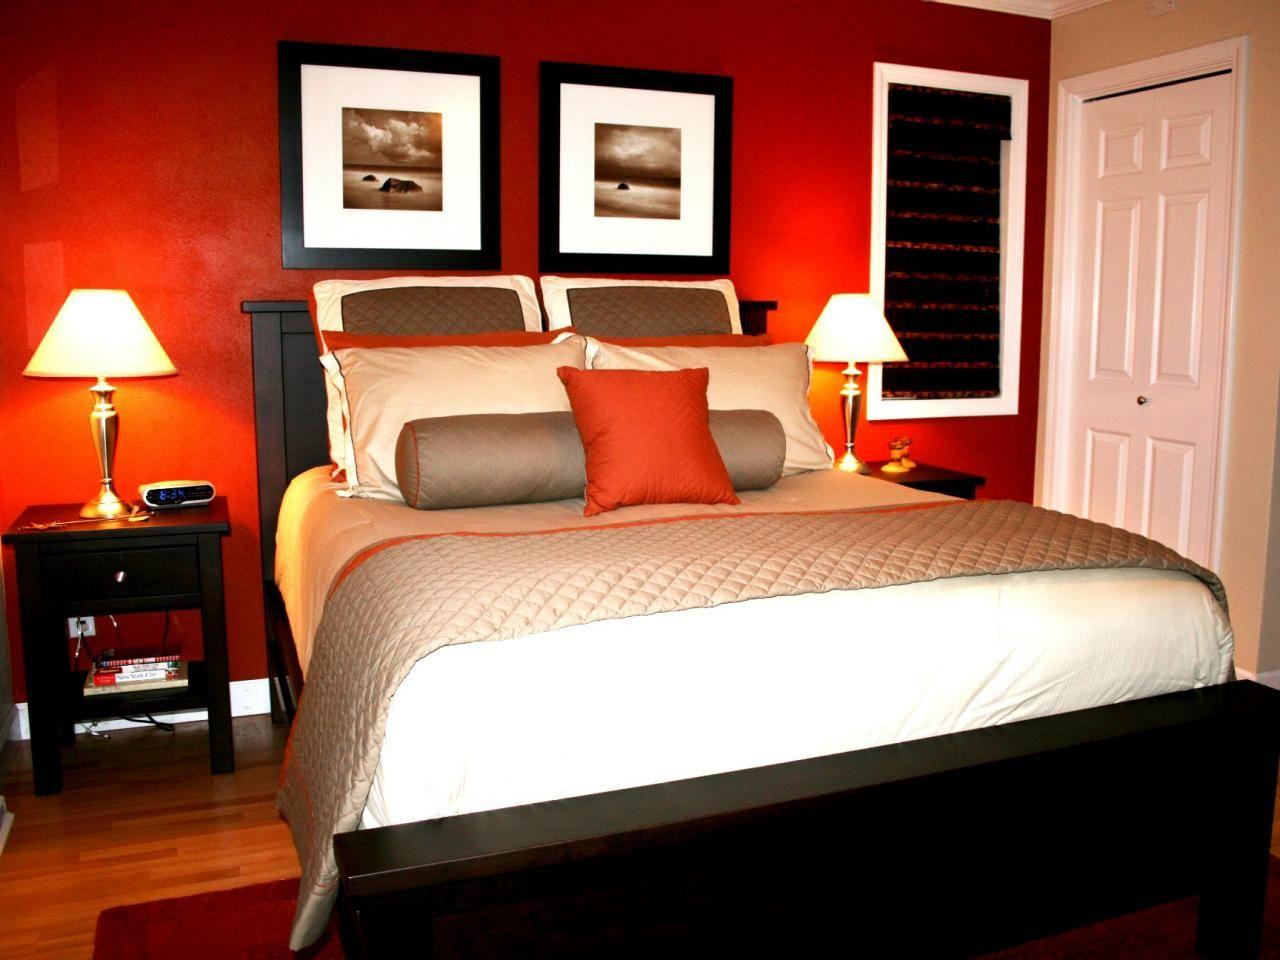 10 Romantic Bedrooms We Love | Decor | Bedroom red, Couple ...